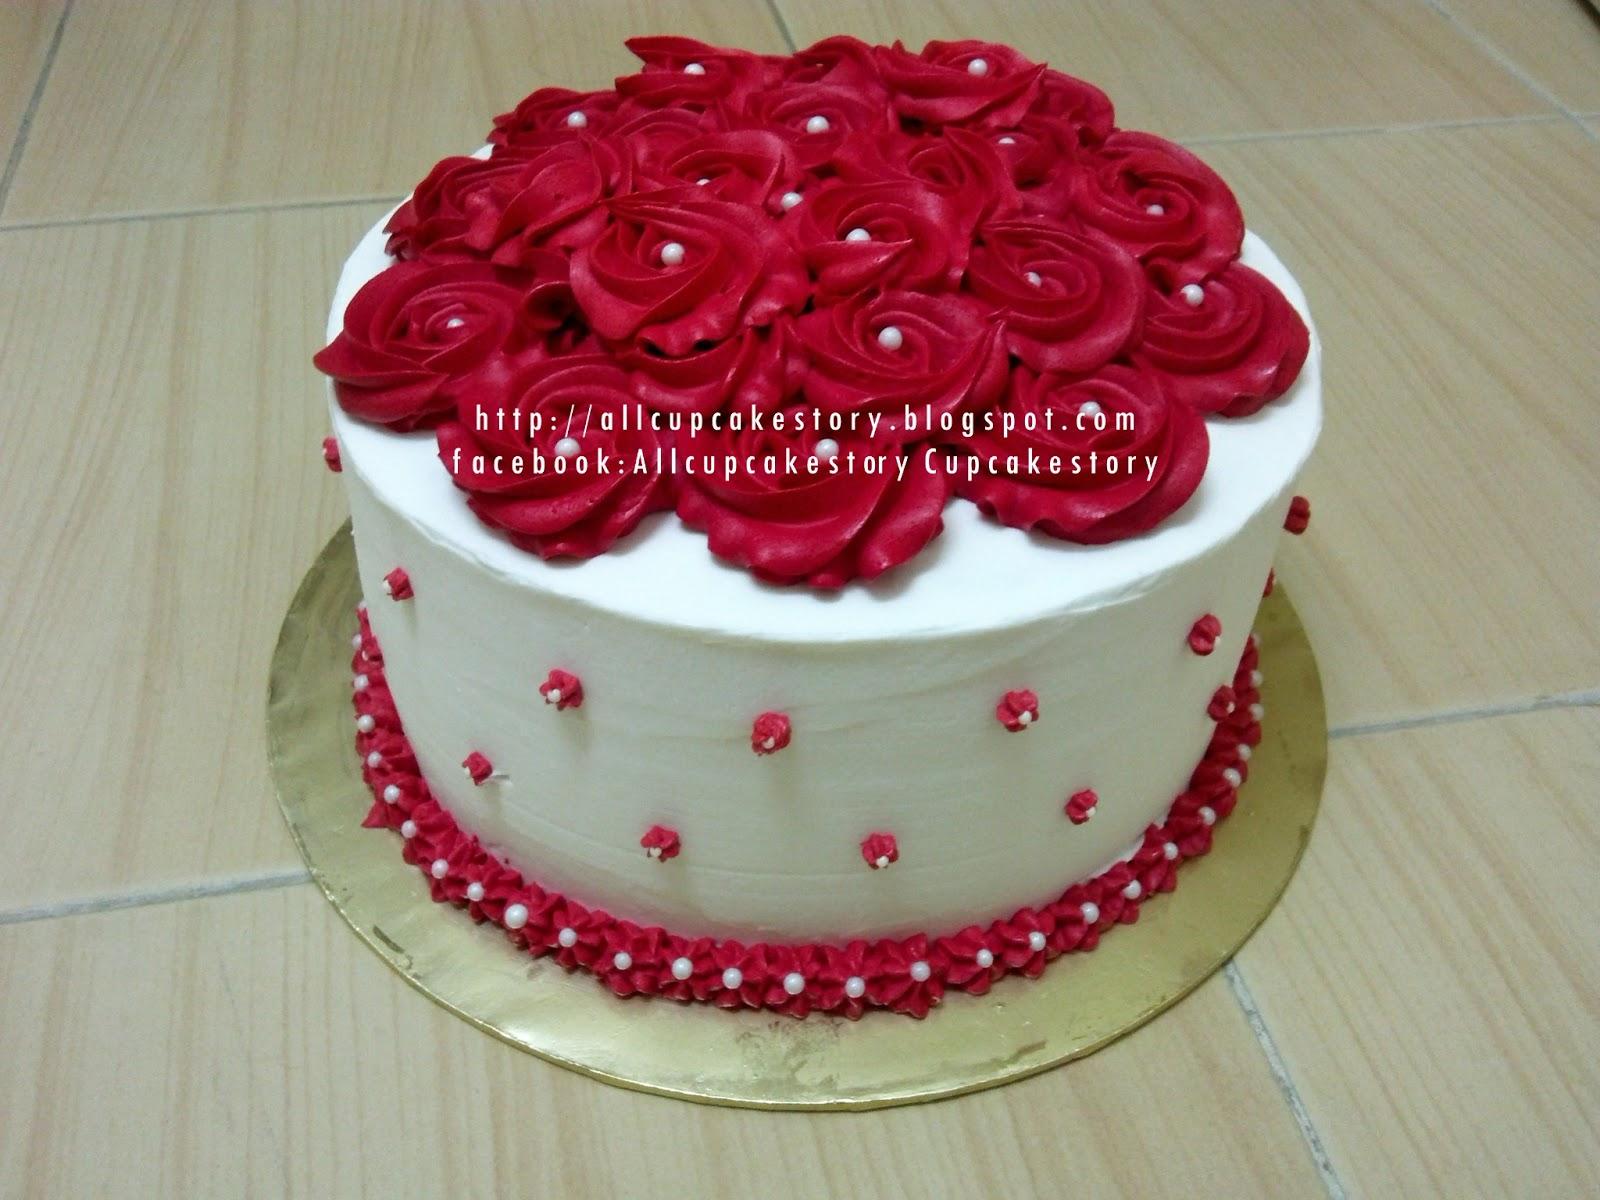 Allcupcakestory red white flower cake red white flower cake mightylinksfo Image collections